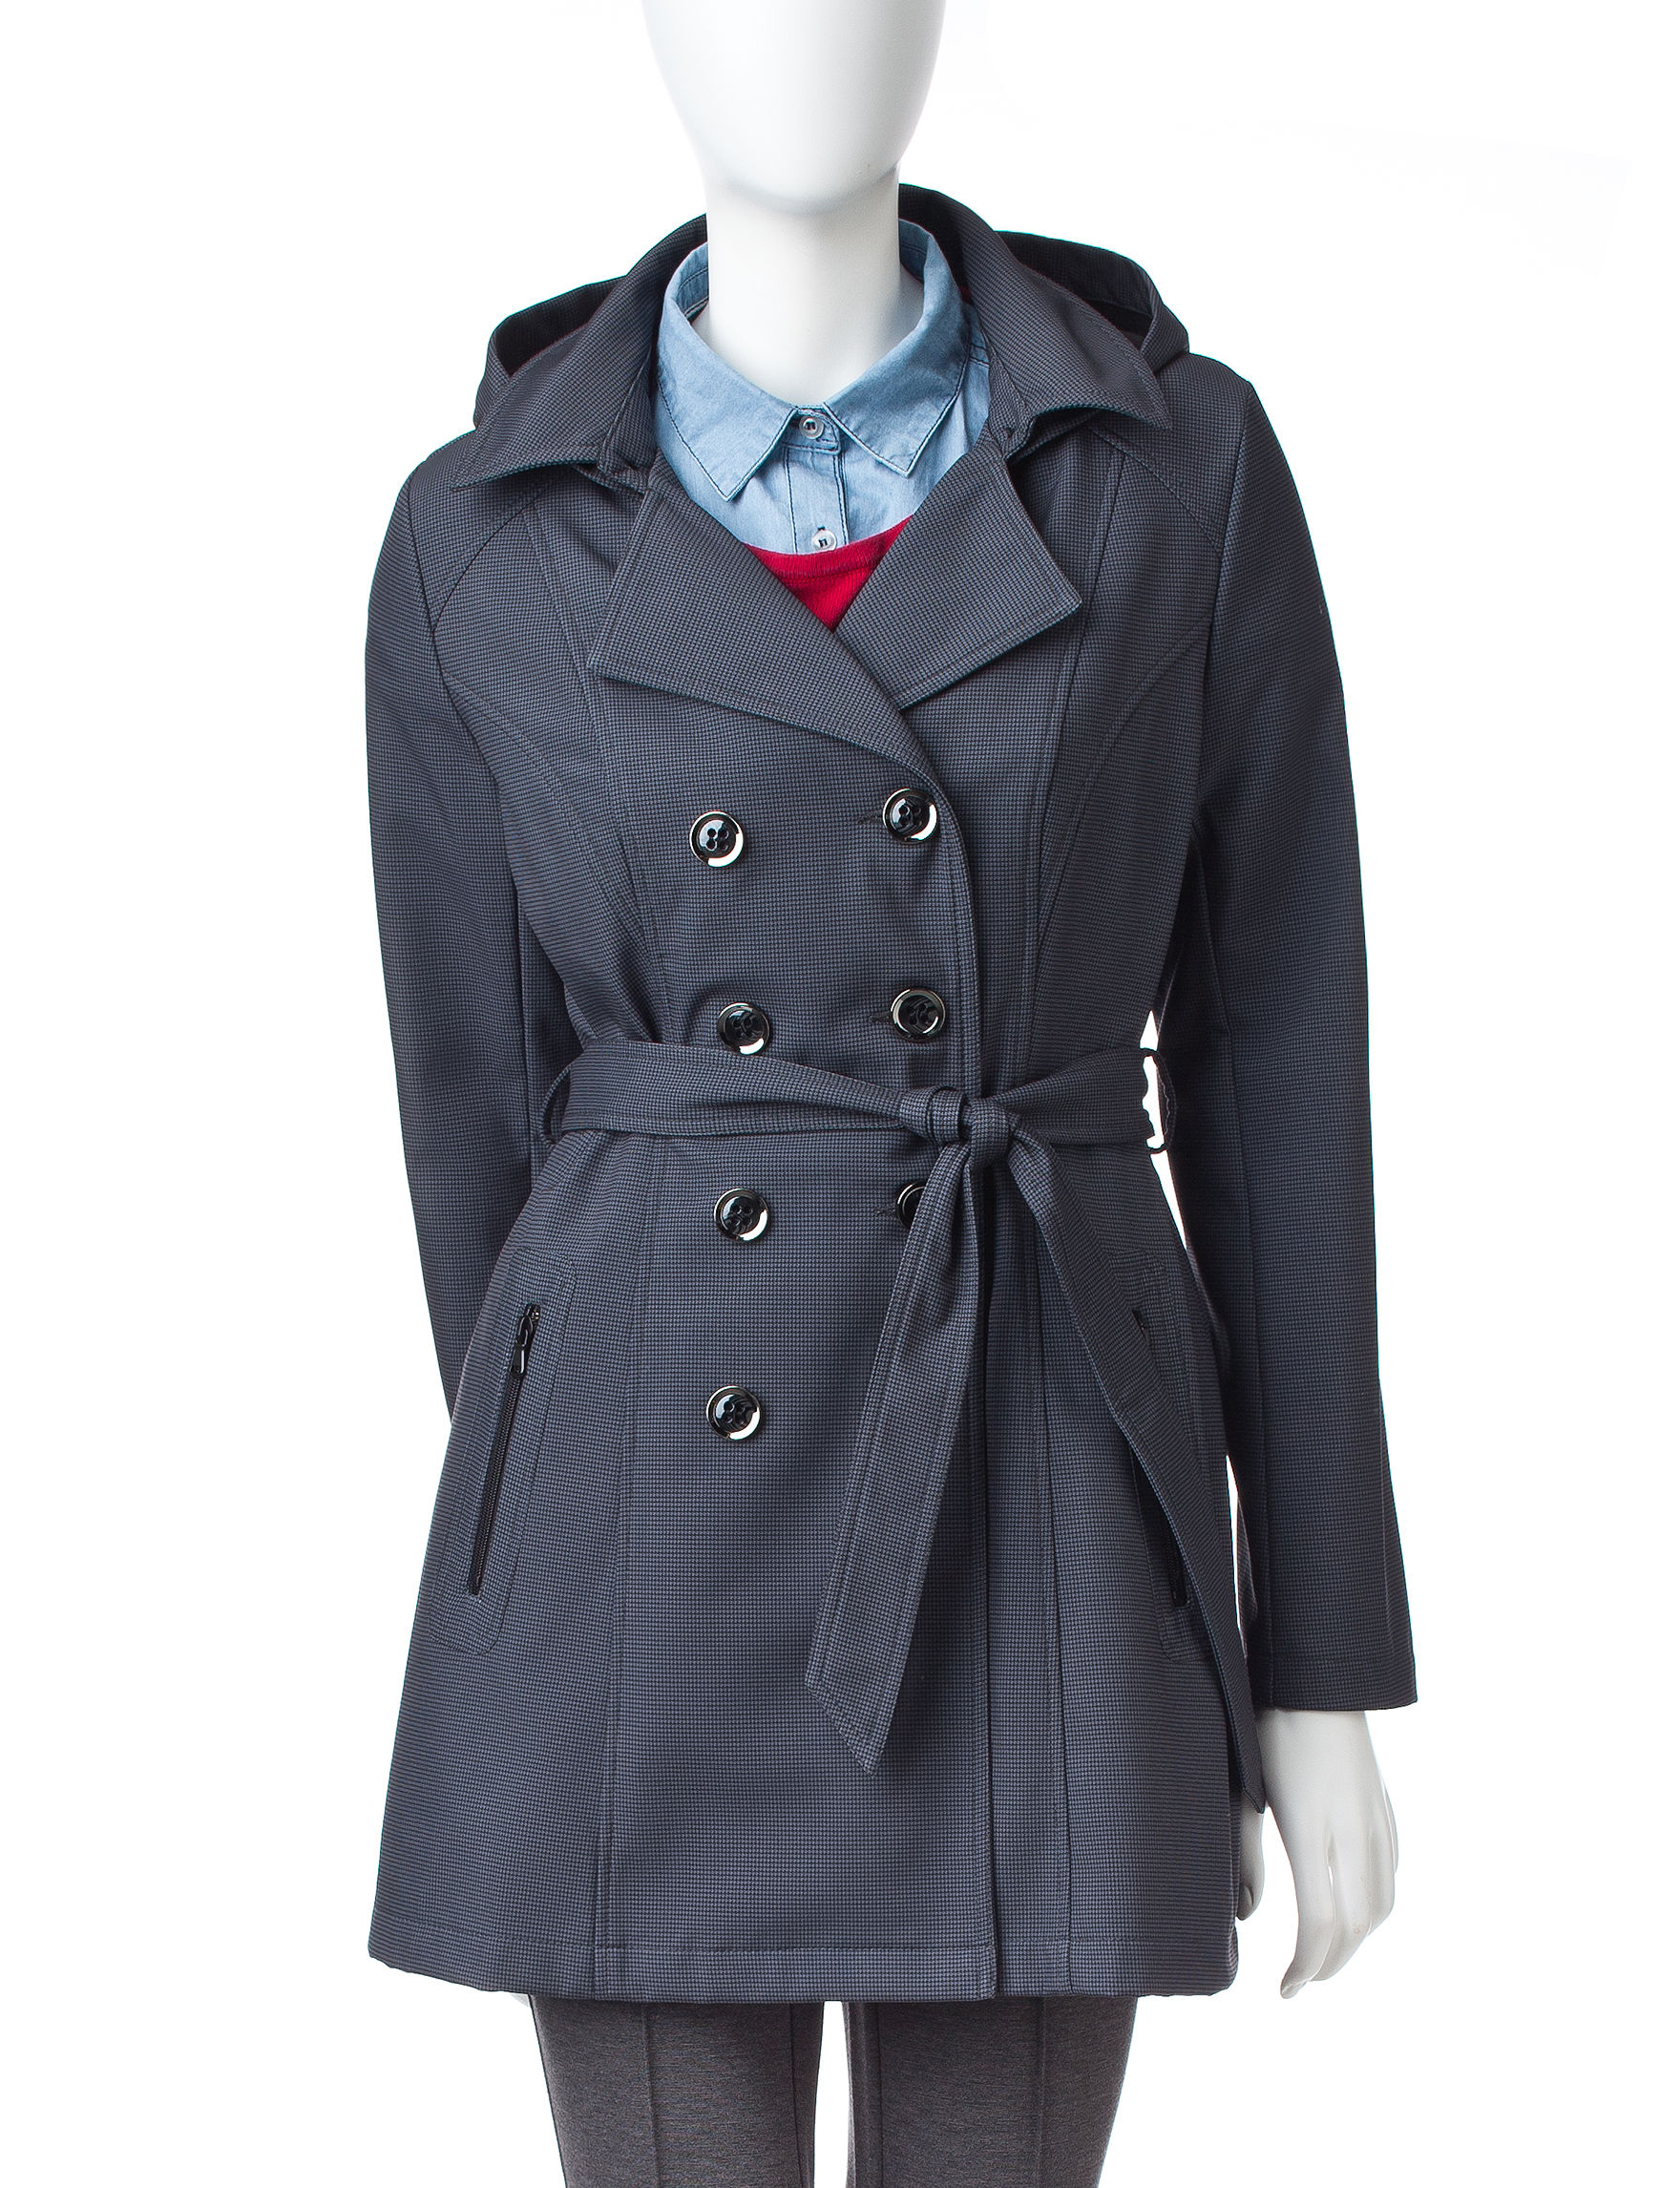 Sebby Collection Grey / Black Peacoats & Overcoats